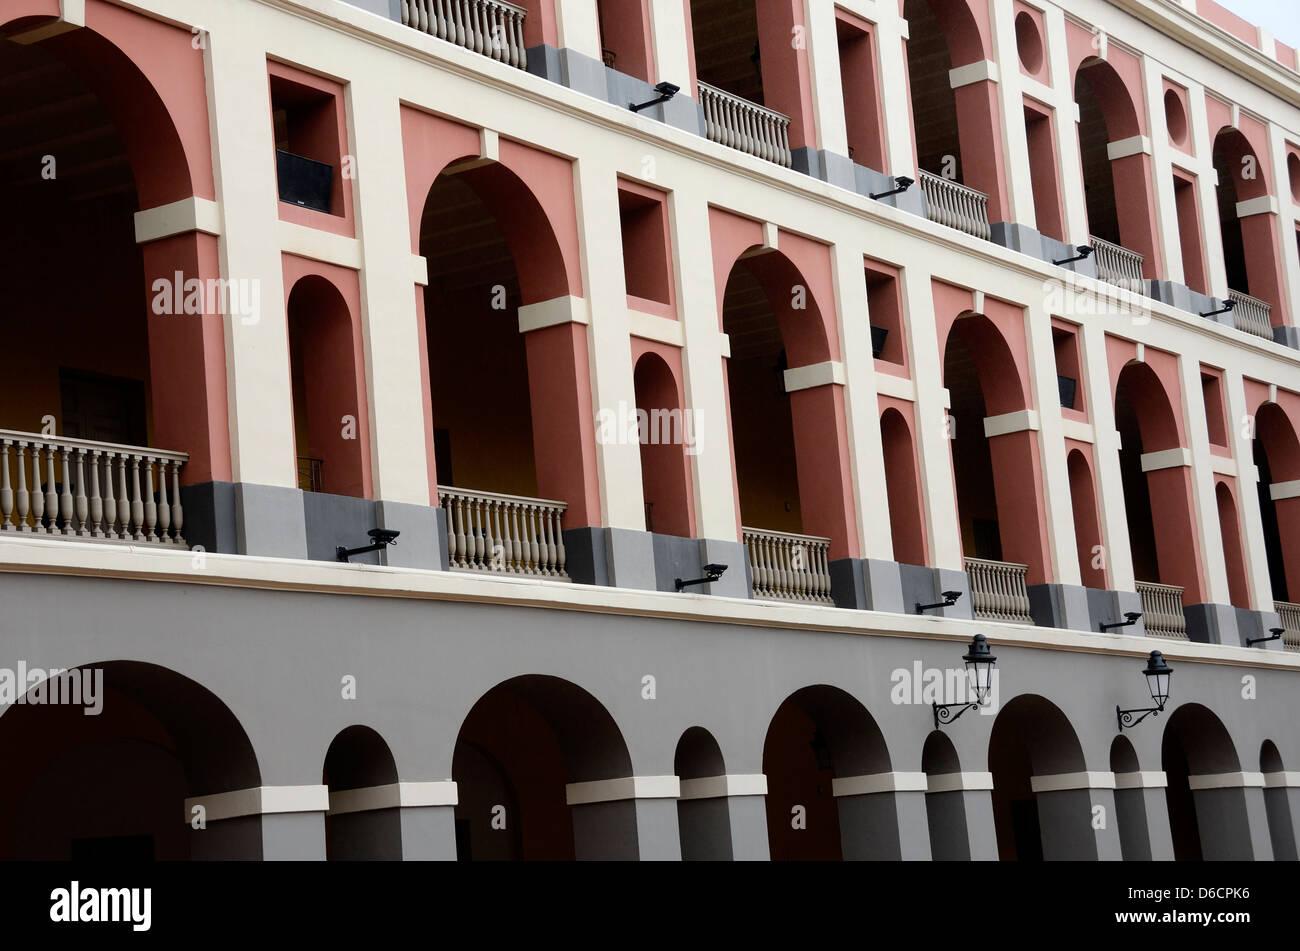 Ballaja Barracks in Old San Juan, Puerto Rico - Stock Image